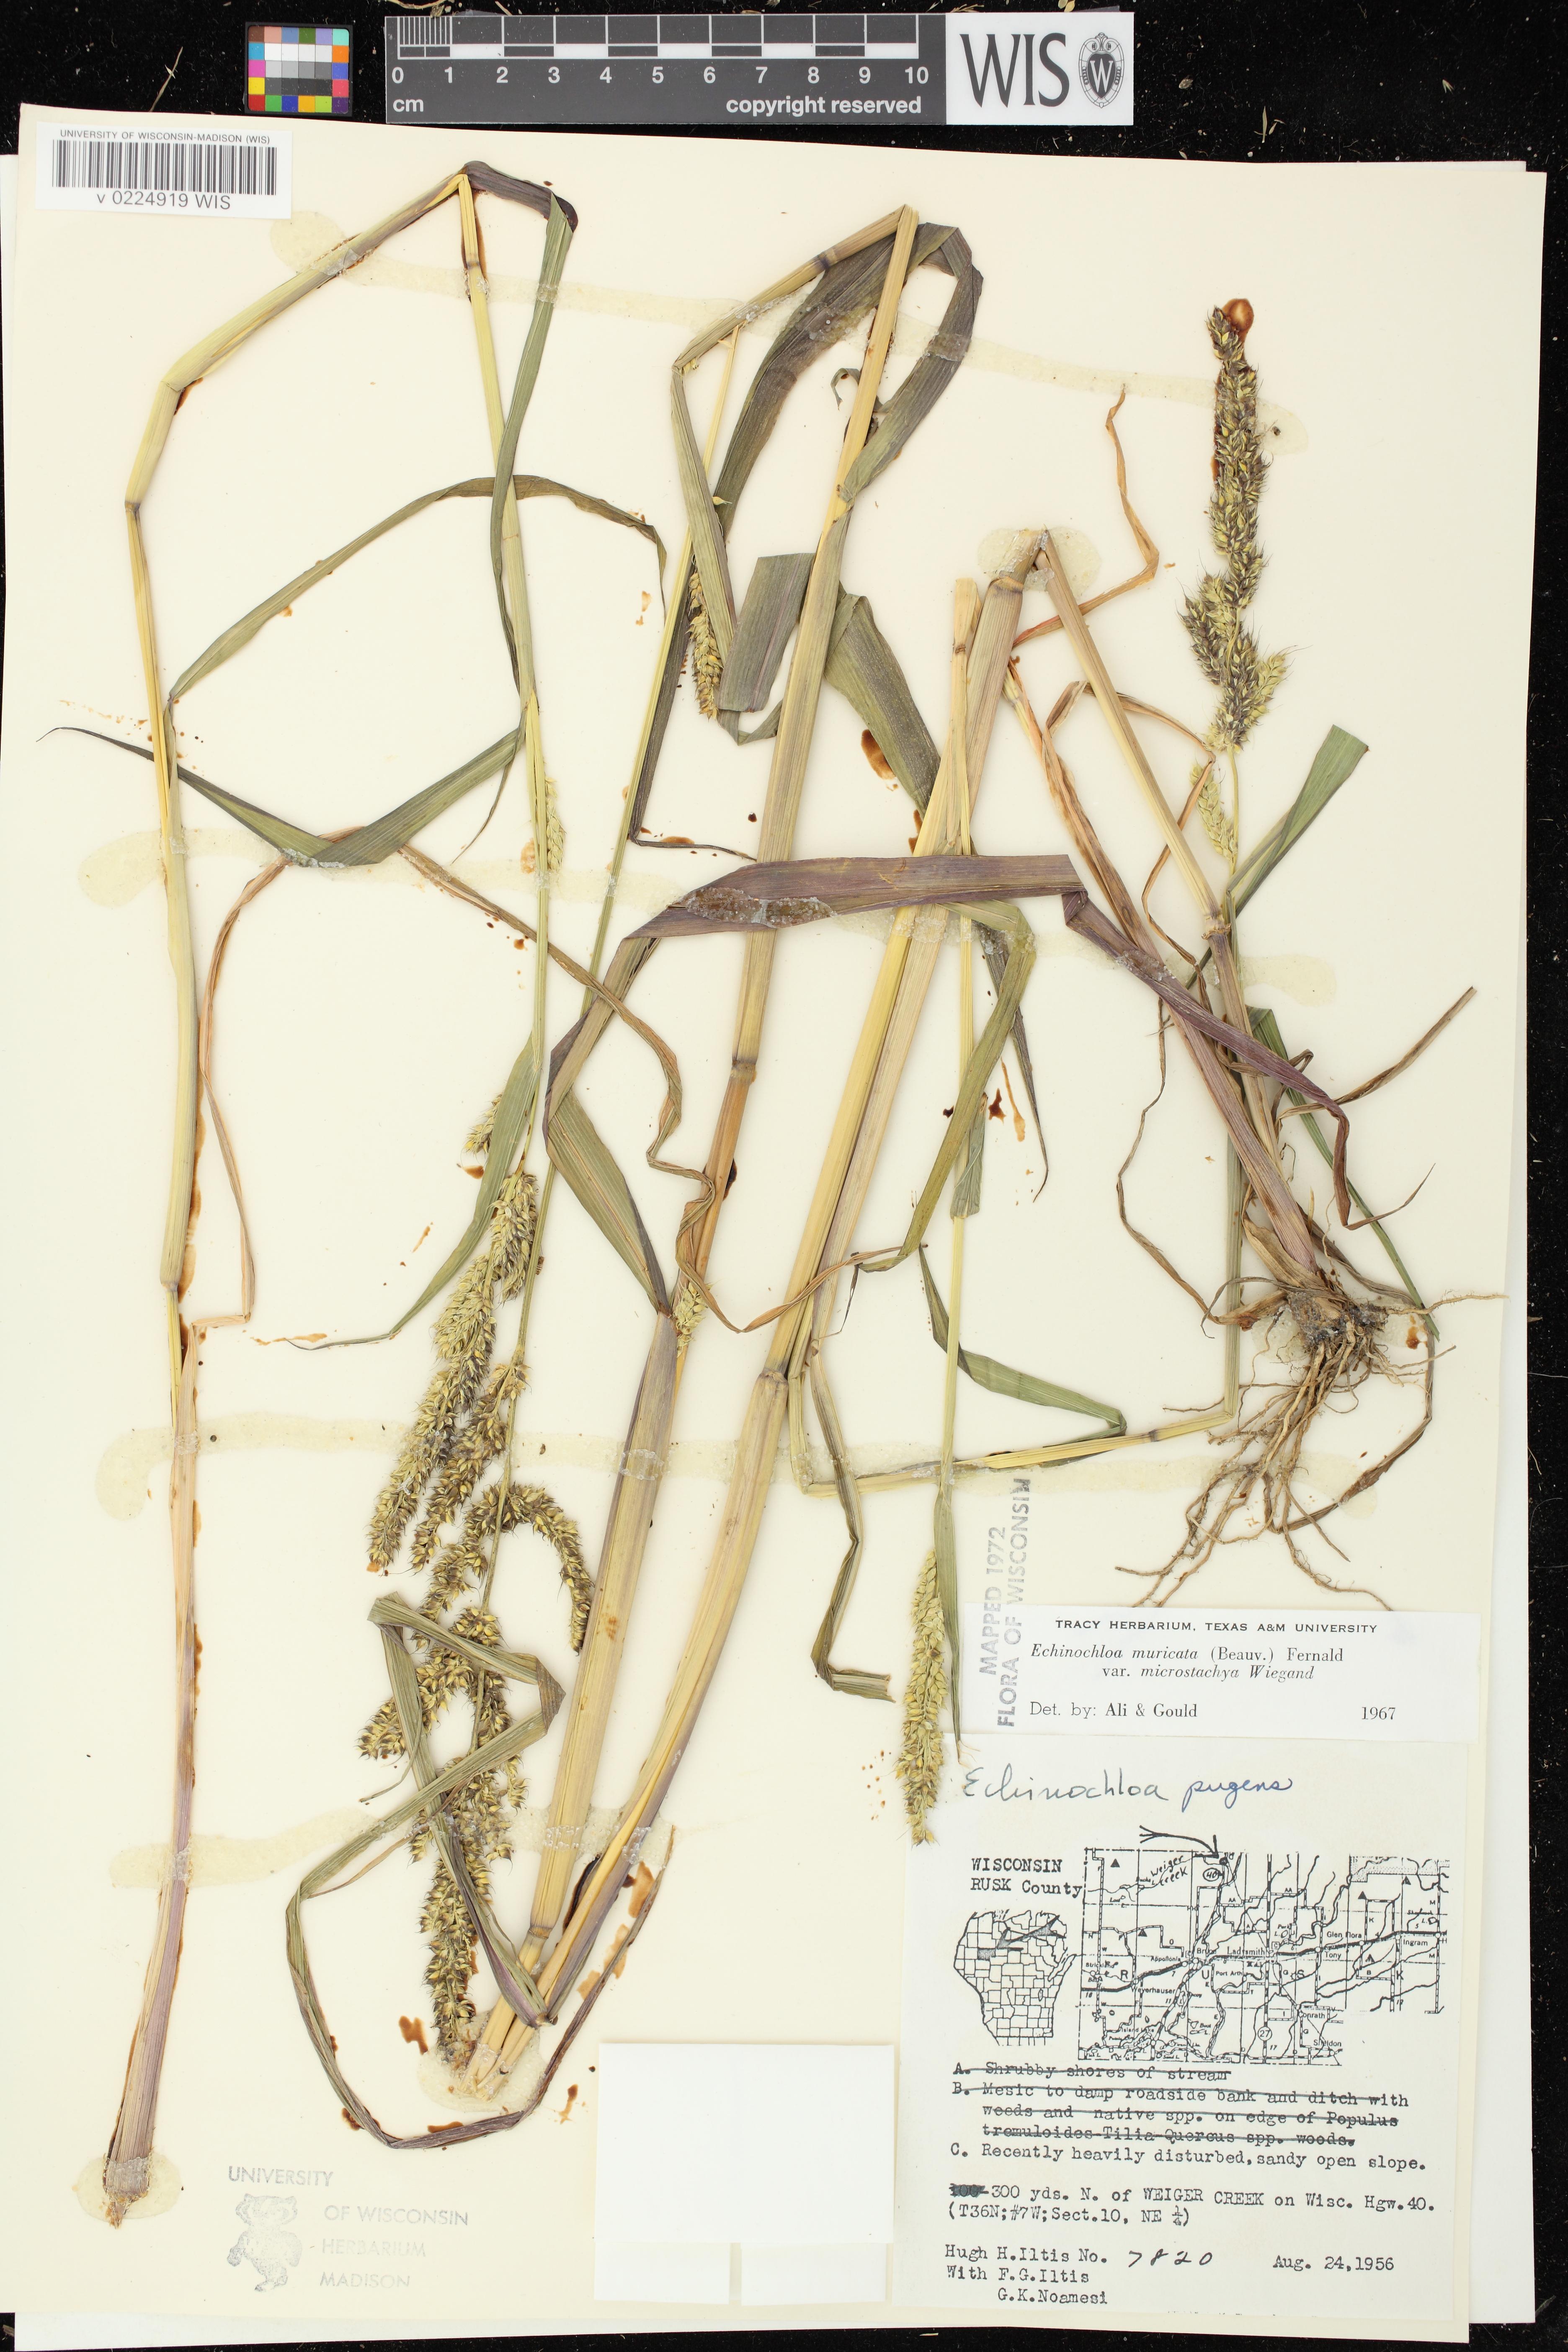 Echinochloa muricata var. microstachya image